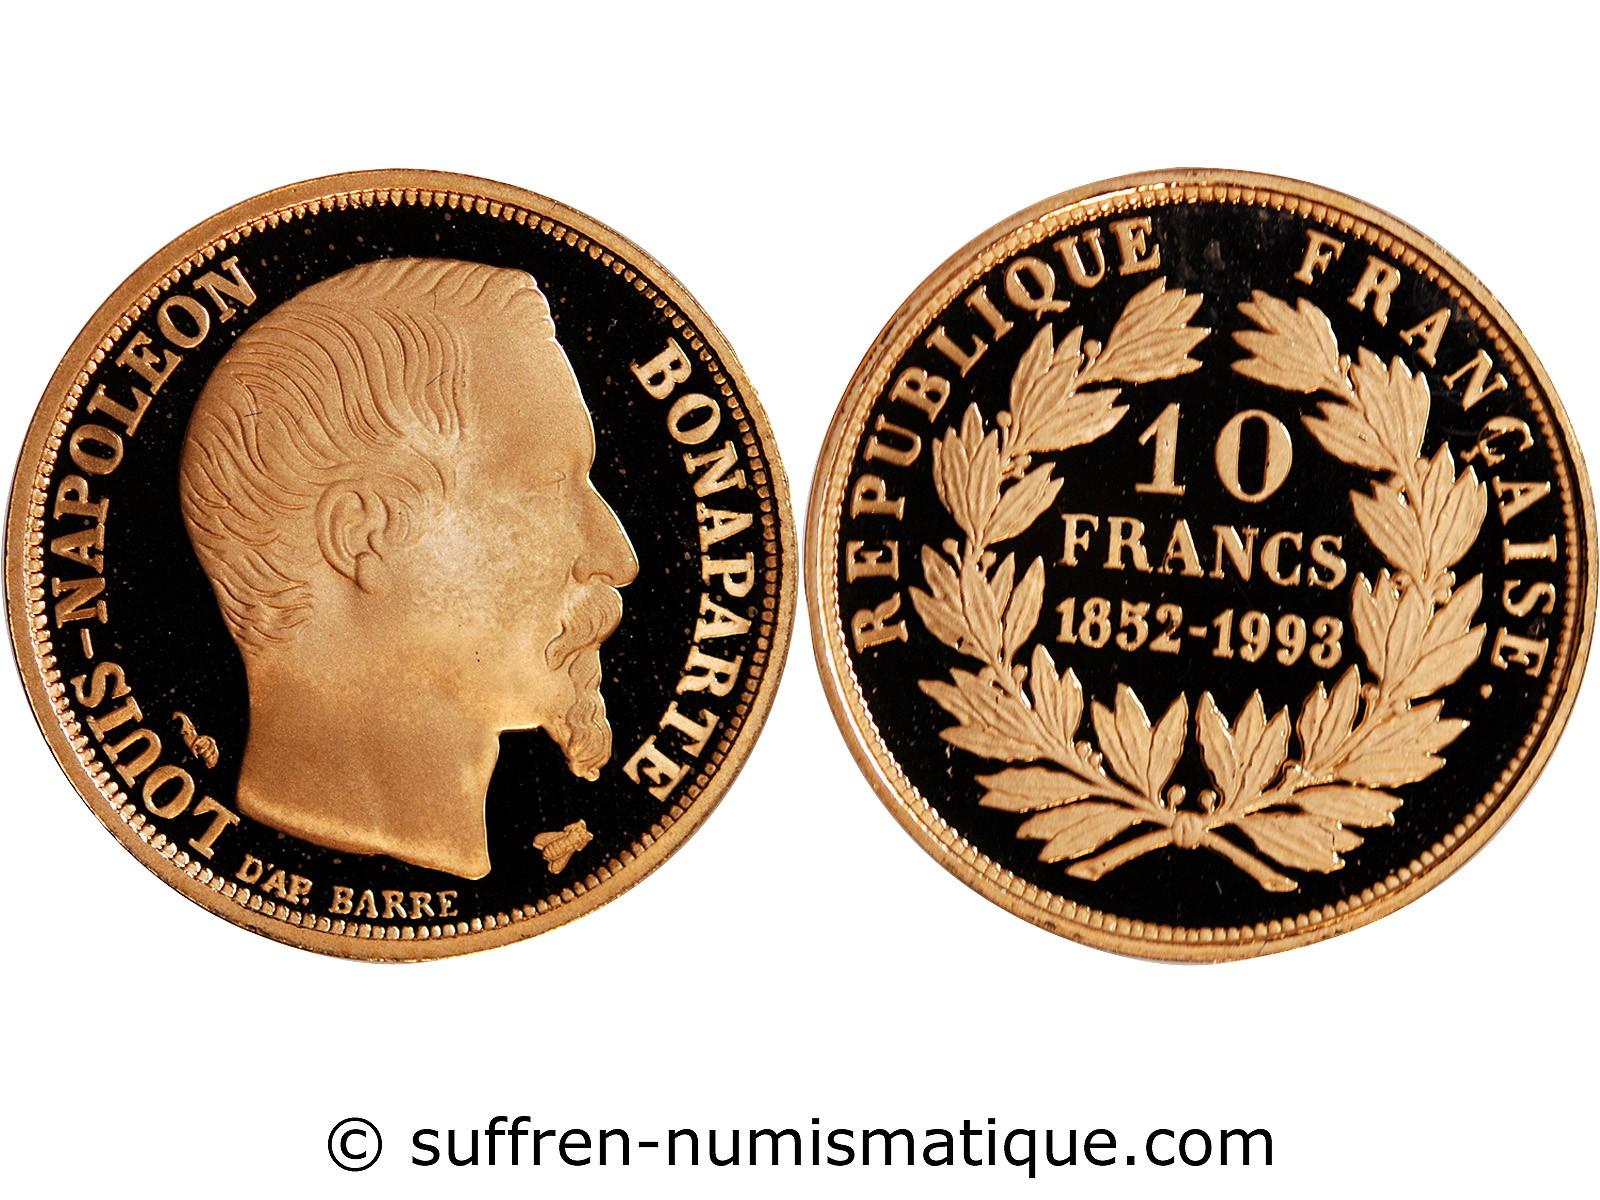 louis napoleon bonaparte 10 francs or 1852 1993. Black Bedroom Furniture Sets. Home Design Ideas